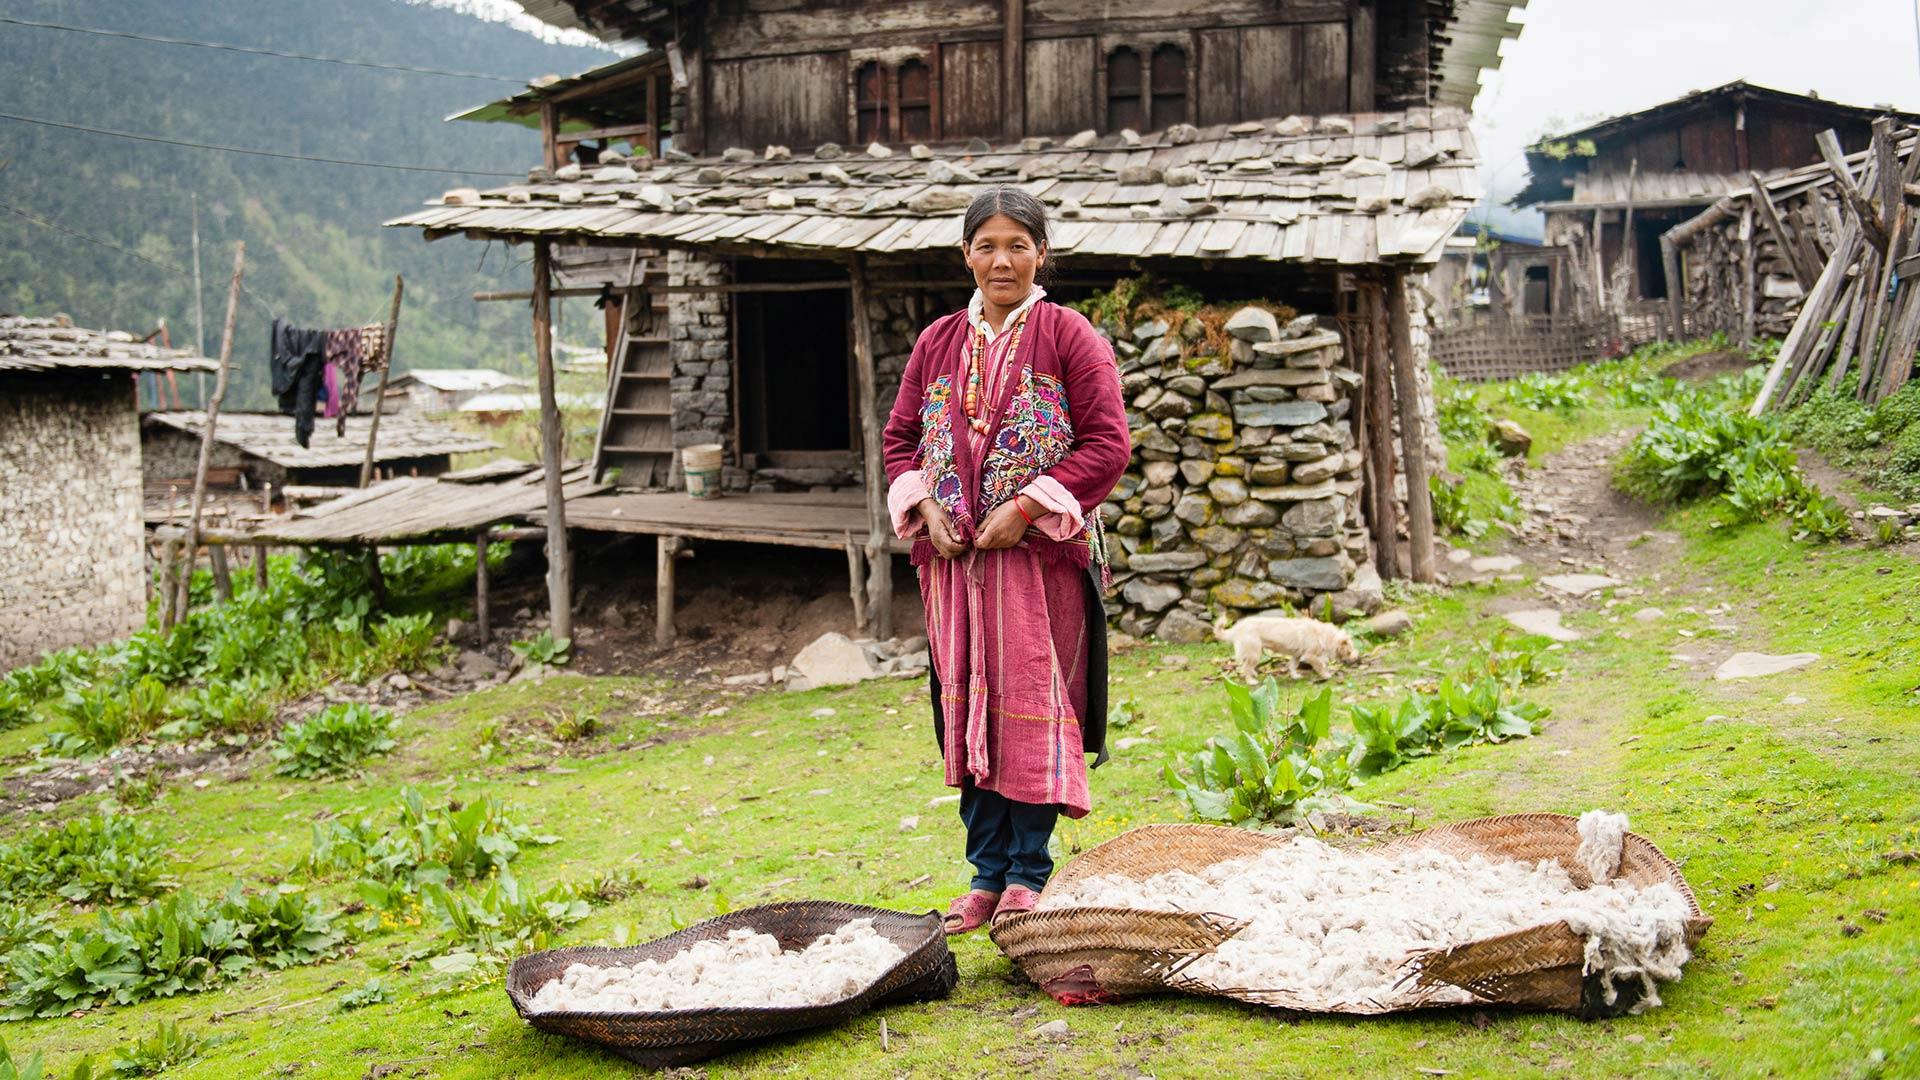 A Brokpa woman drying sheep's wool in a village in eastern Bhutan